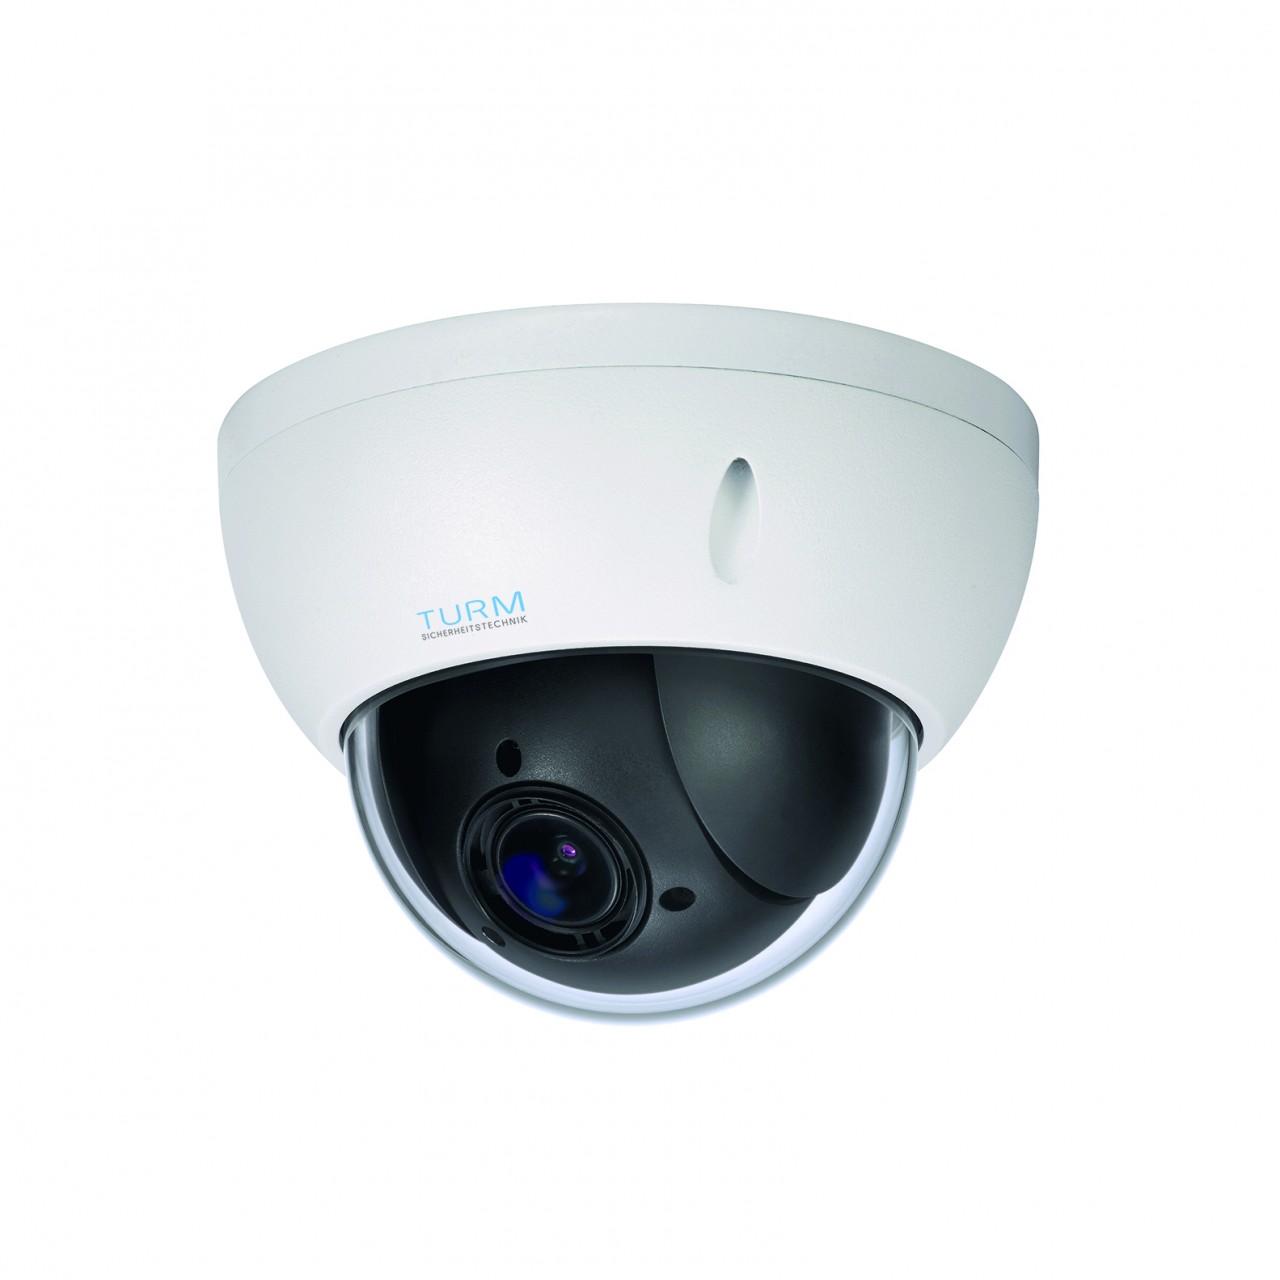 TURM IP Professional 2 MP PTZ Dome Kamera mit 4x Zoom, Micro SD, PoE und Onvif